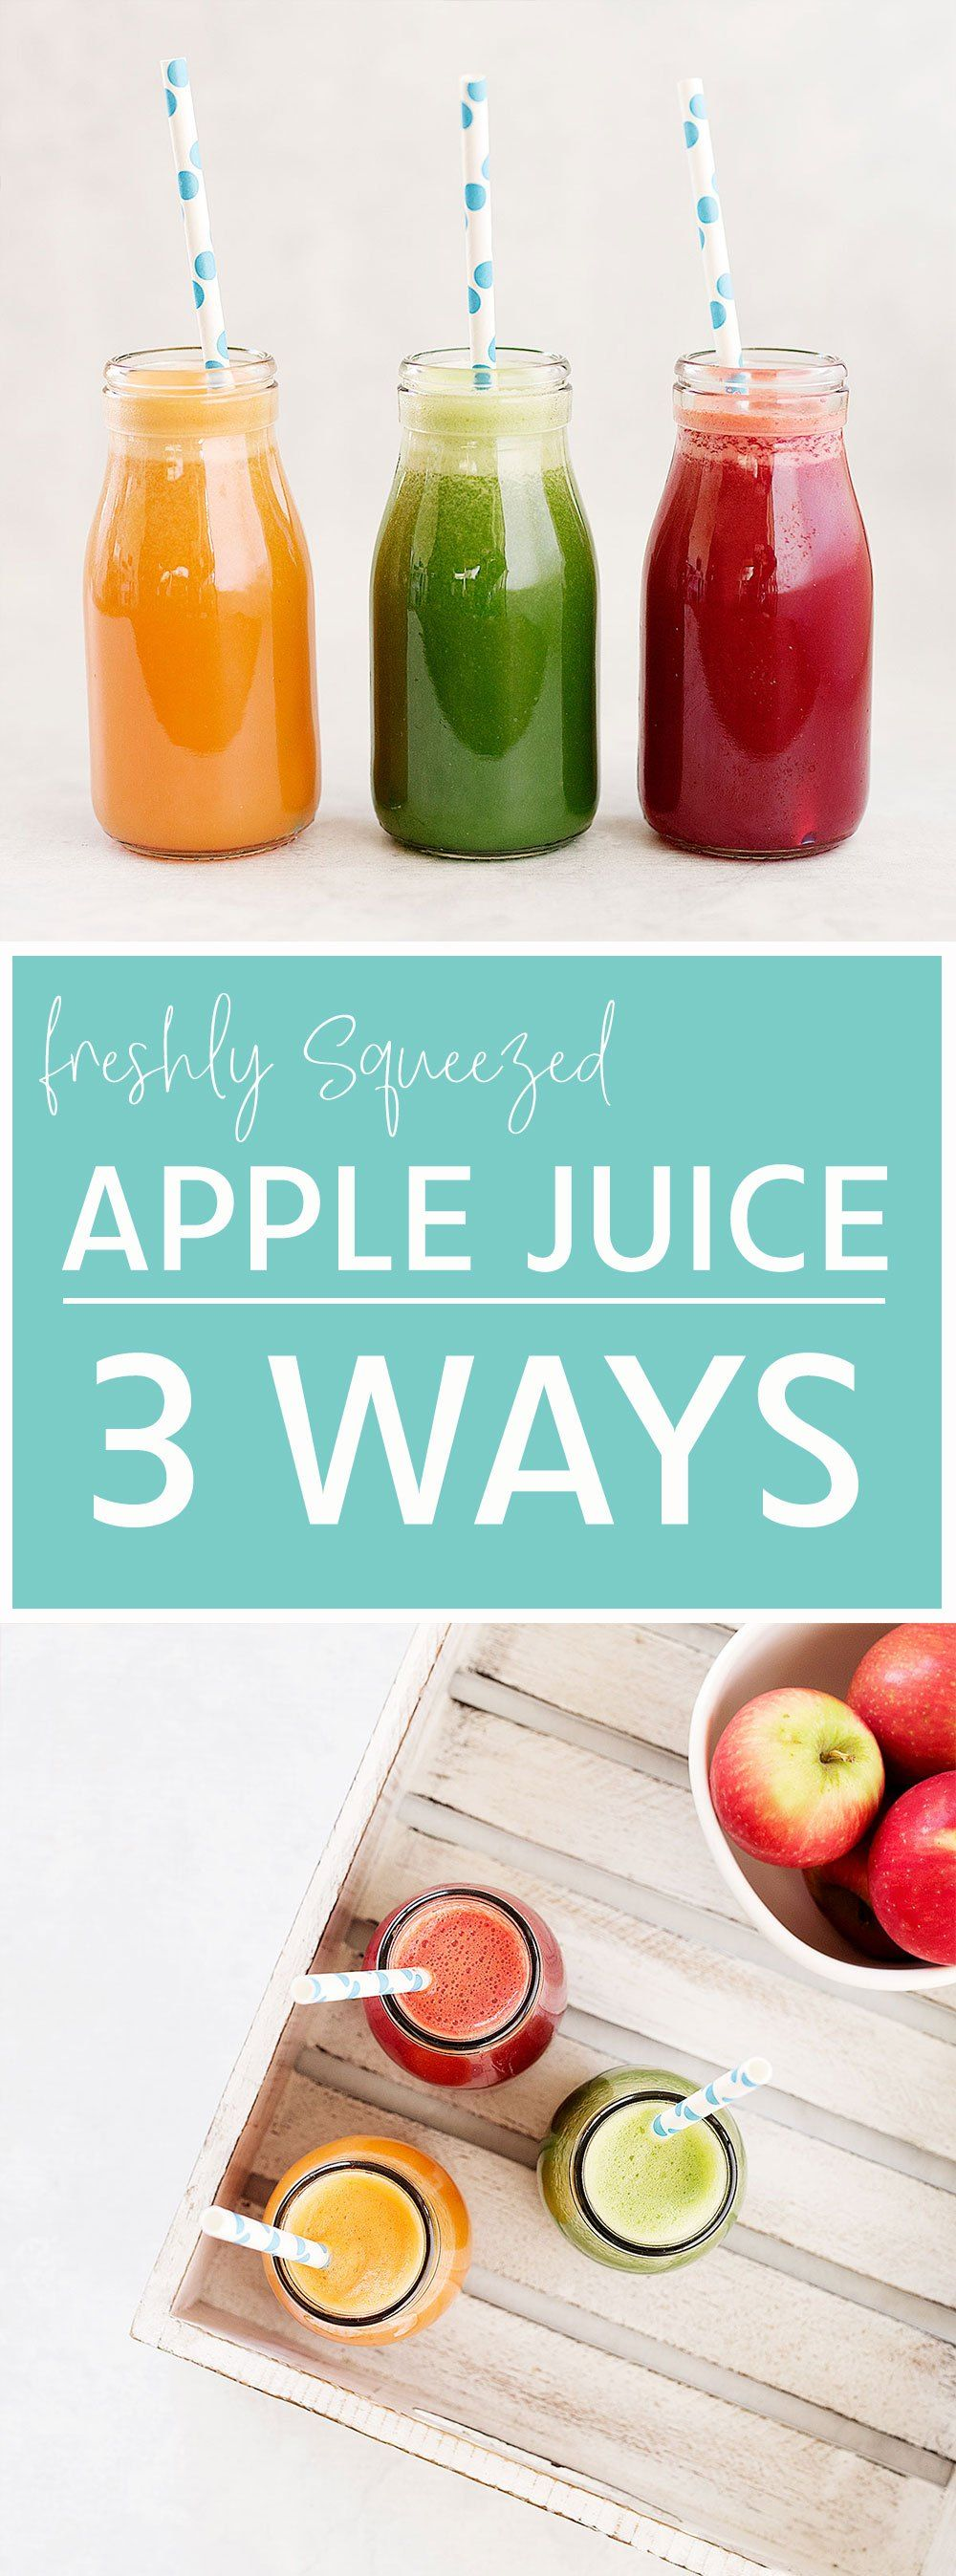 Freshly Squeezed Apple Juice 3 Ways Kids Eat by Shanai